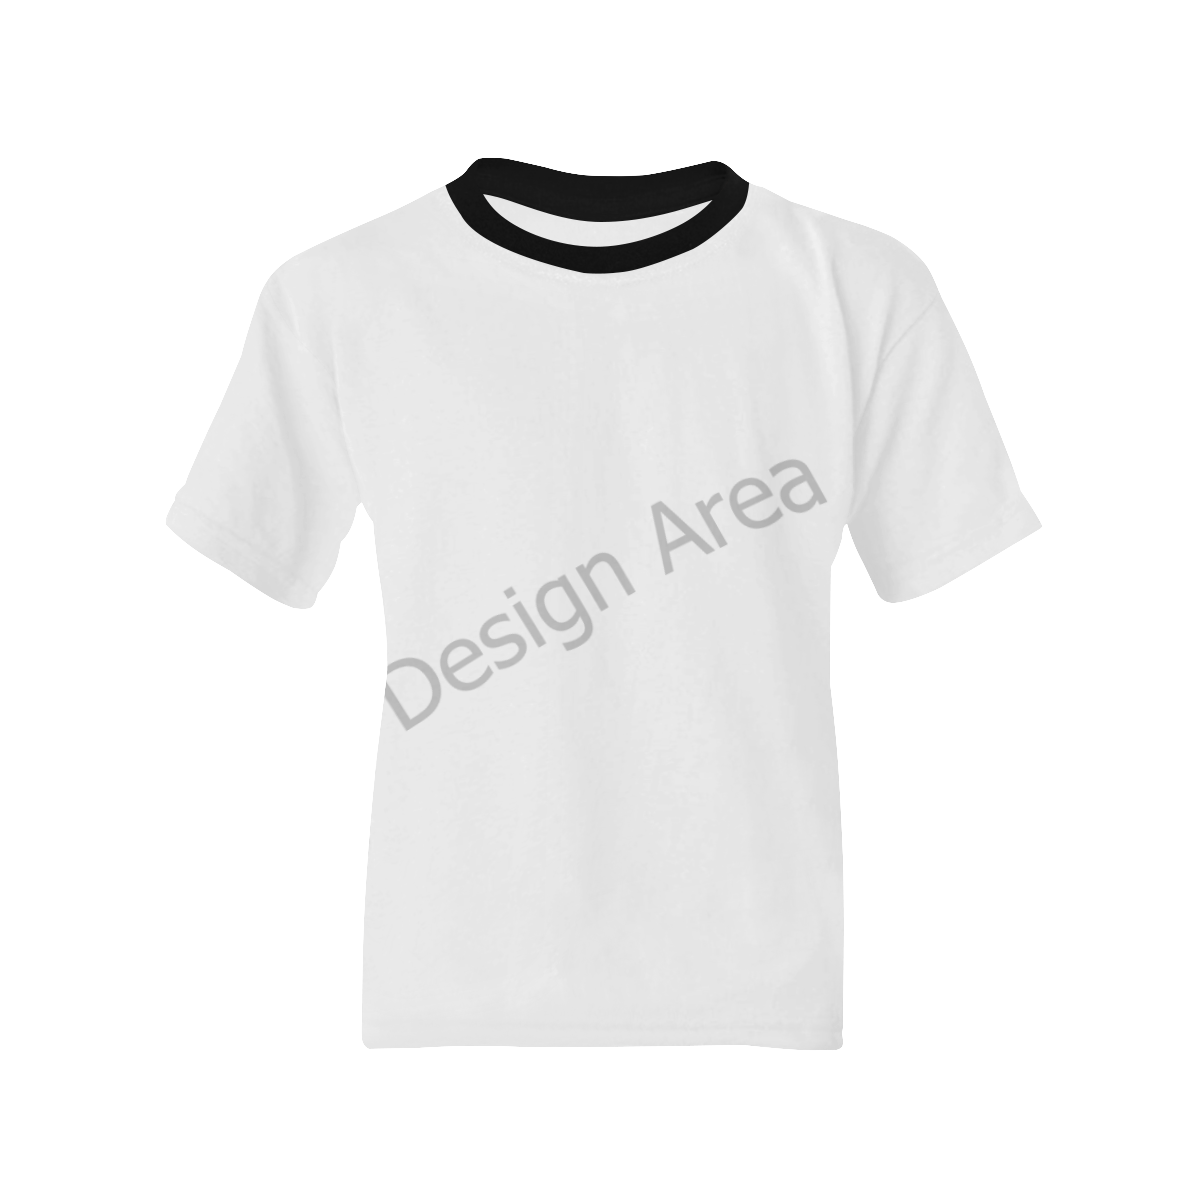 Kids' All Over Print T-shirt (Model T65)